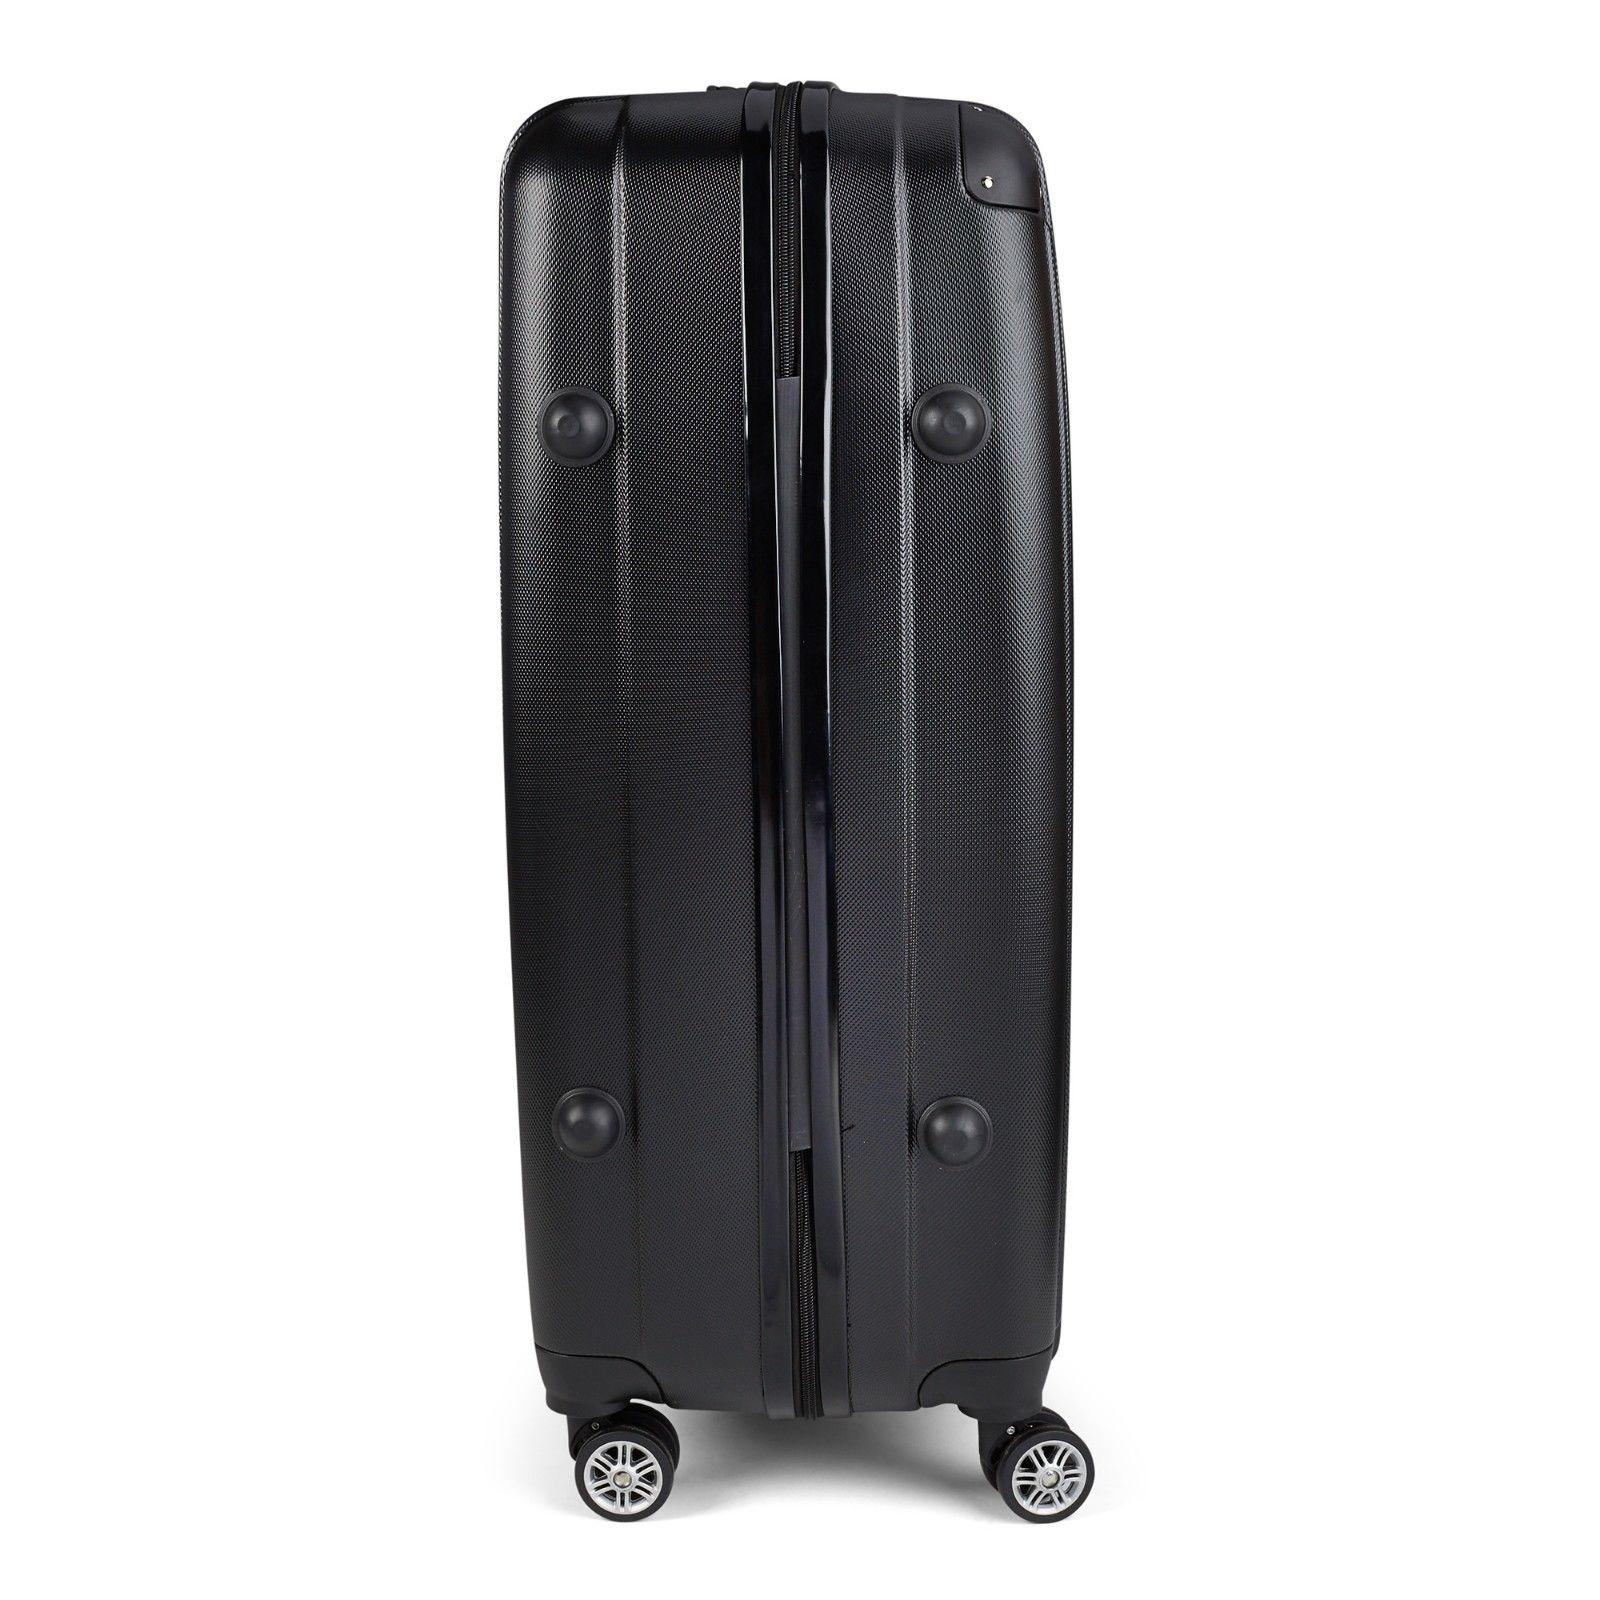 Milano-Premium-3pc-ABS-Luggage-Suitcase-Luxury-Hard-Case-Shockproof-Travel-Set thumbnail 9